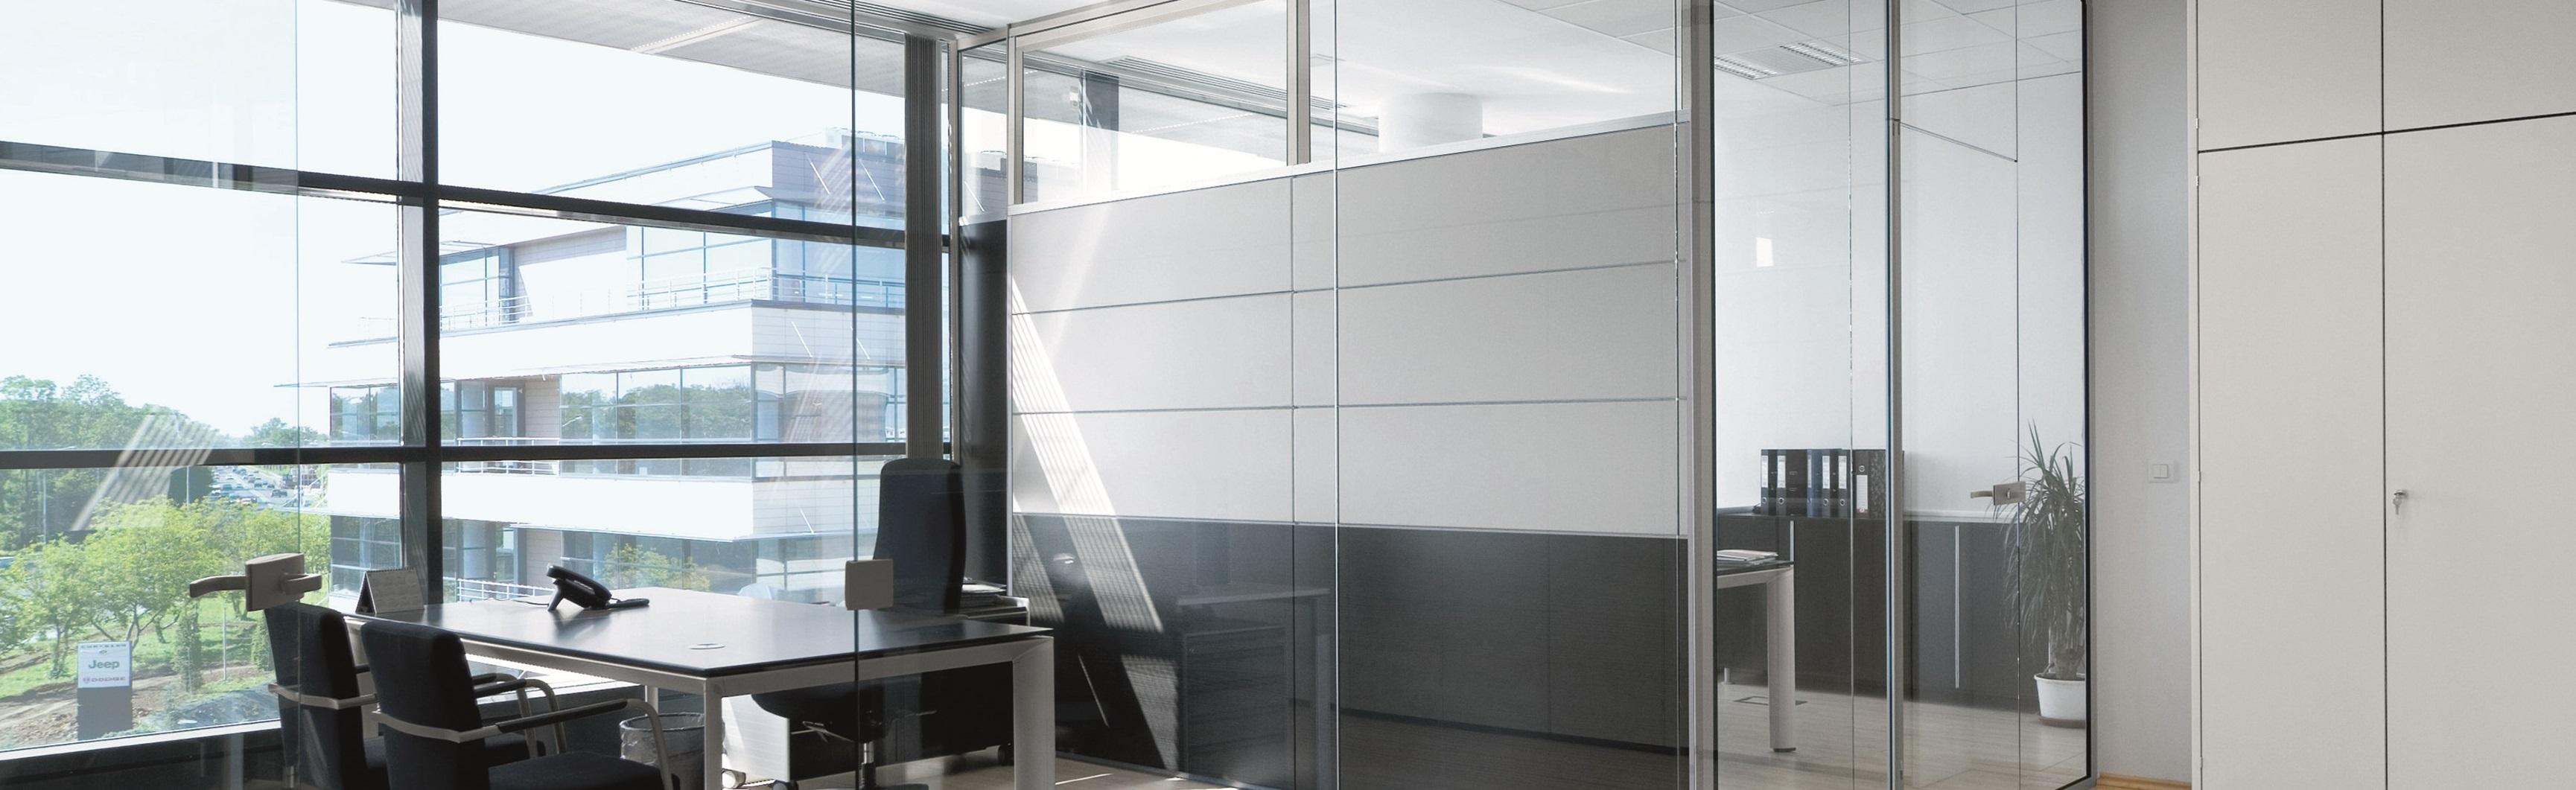 glass-office-walls